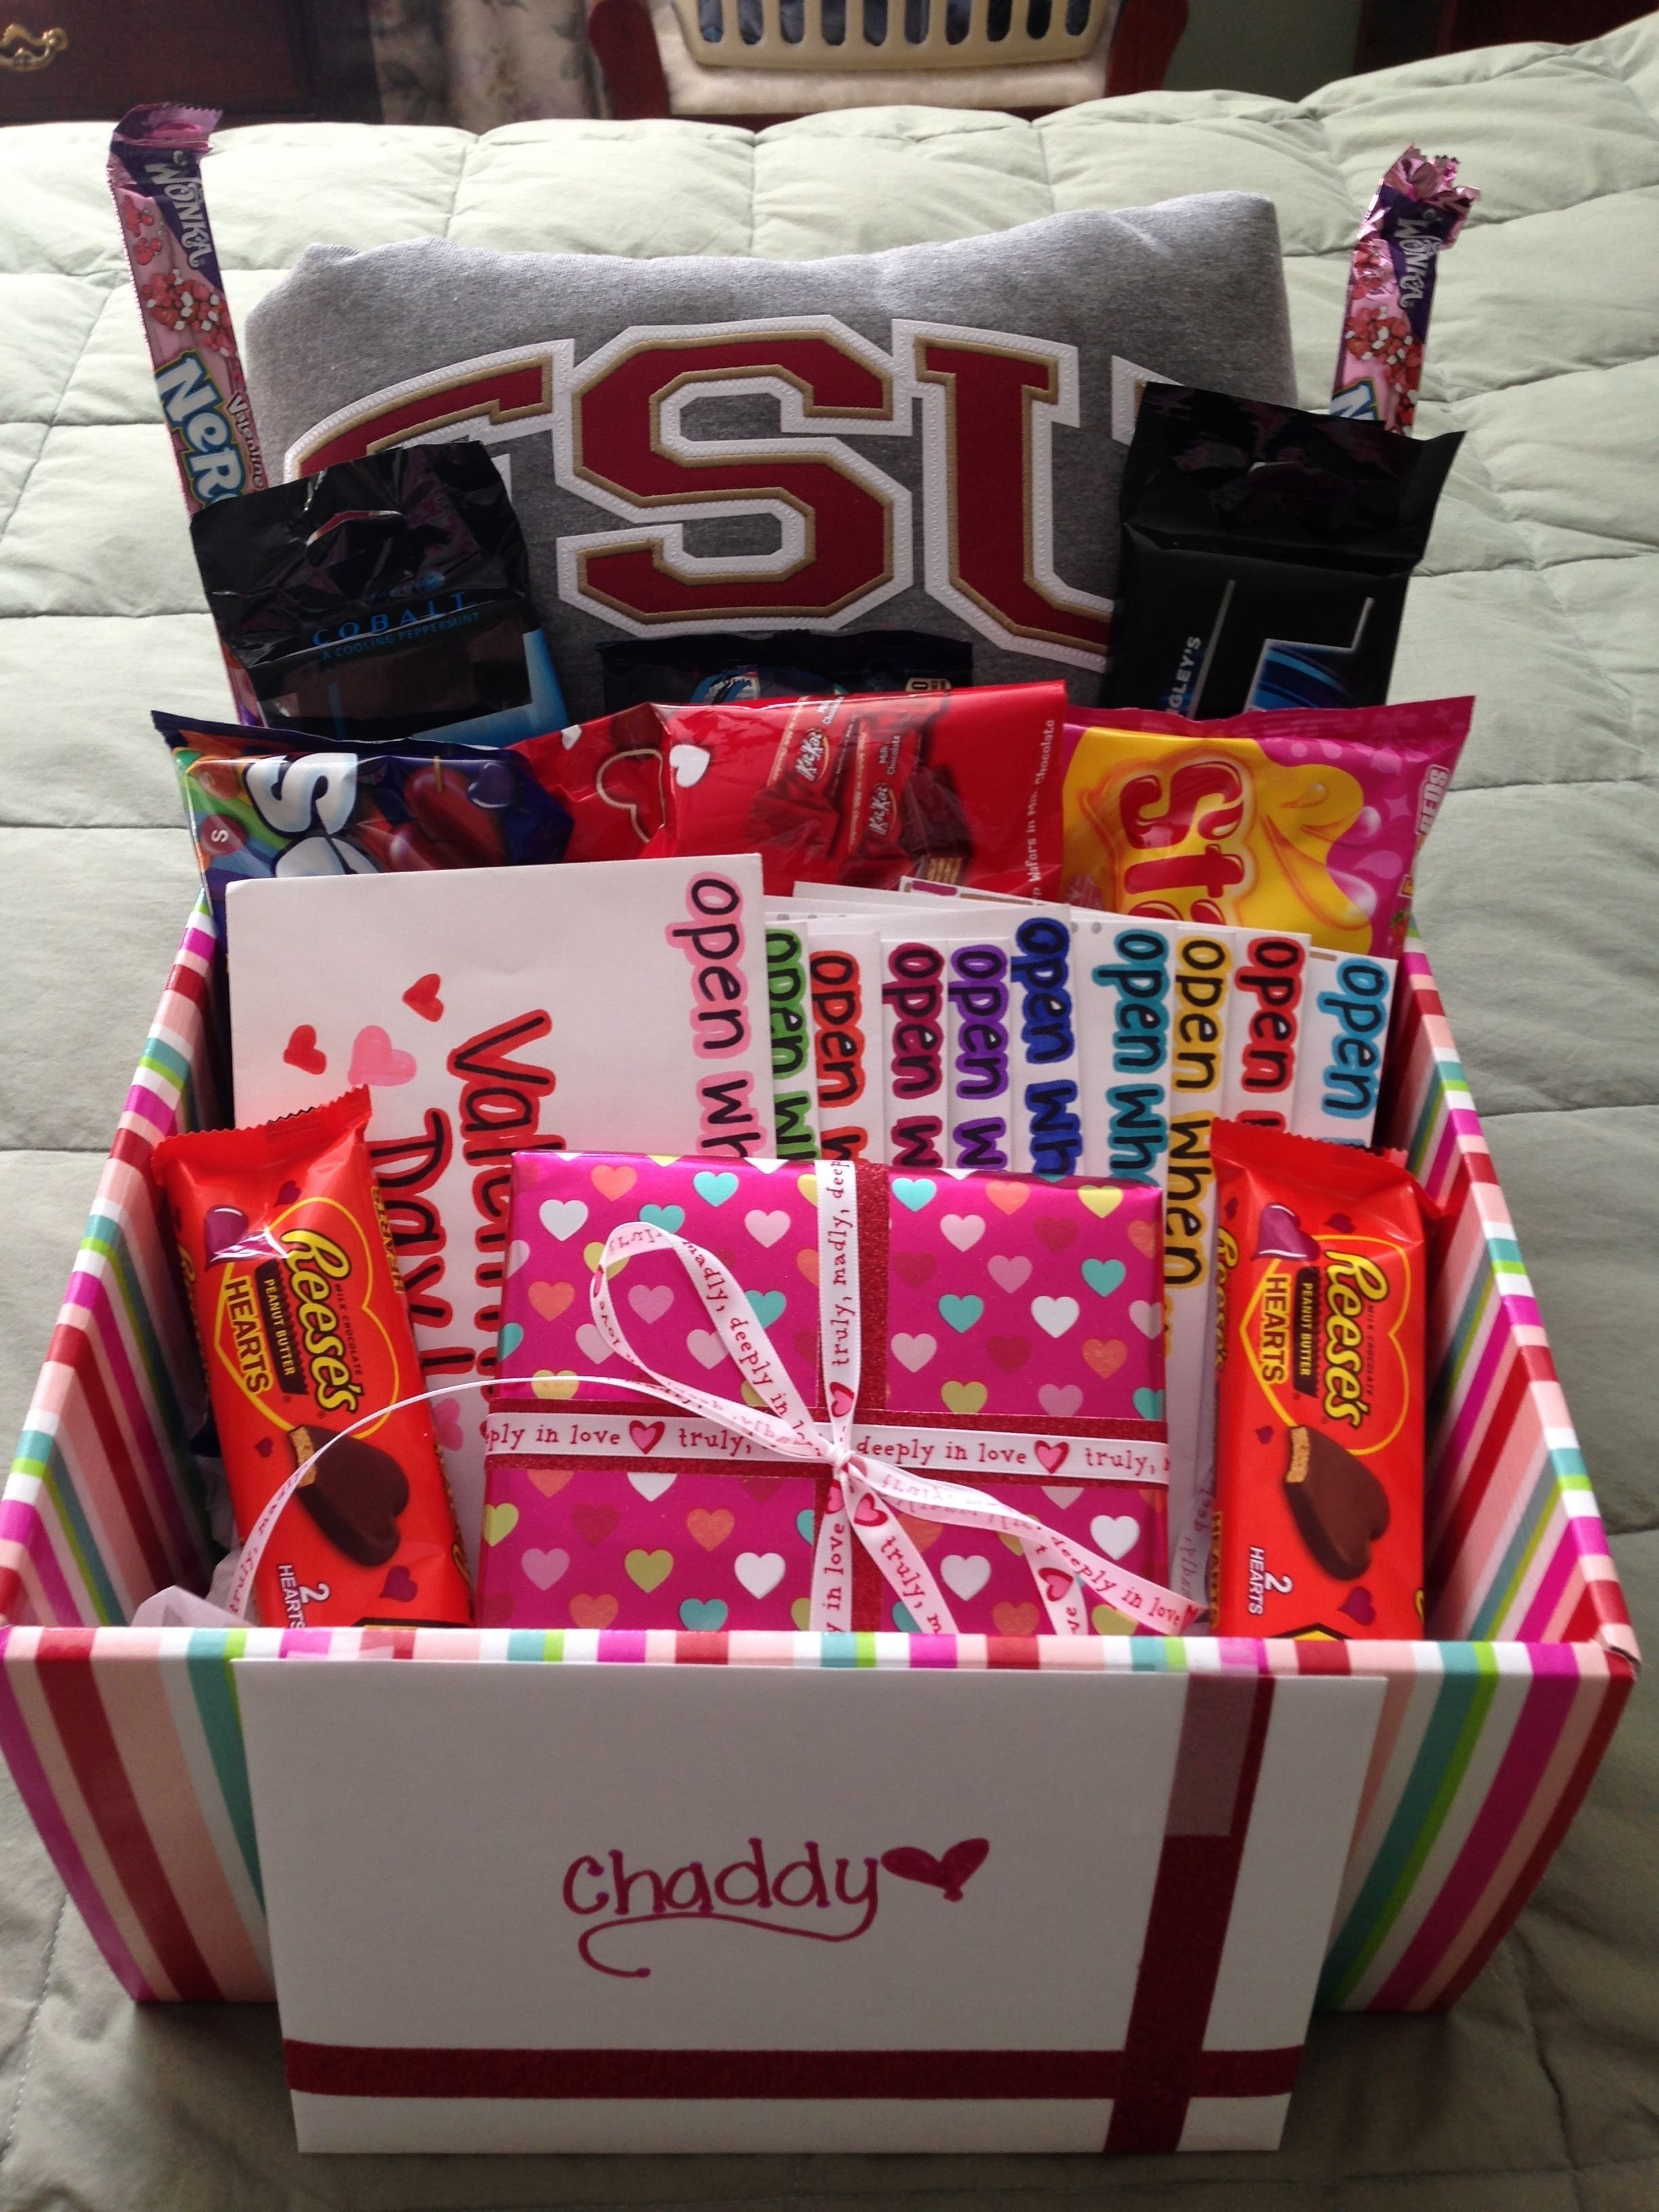 10 Stunning Cute Gift Ideas For Boyfriend valentines day gift for him valentines day gift basket open when 5 2020